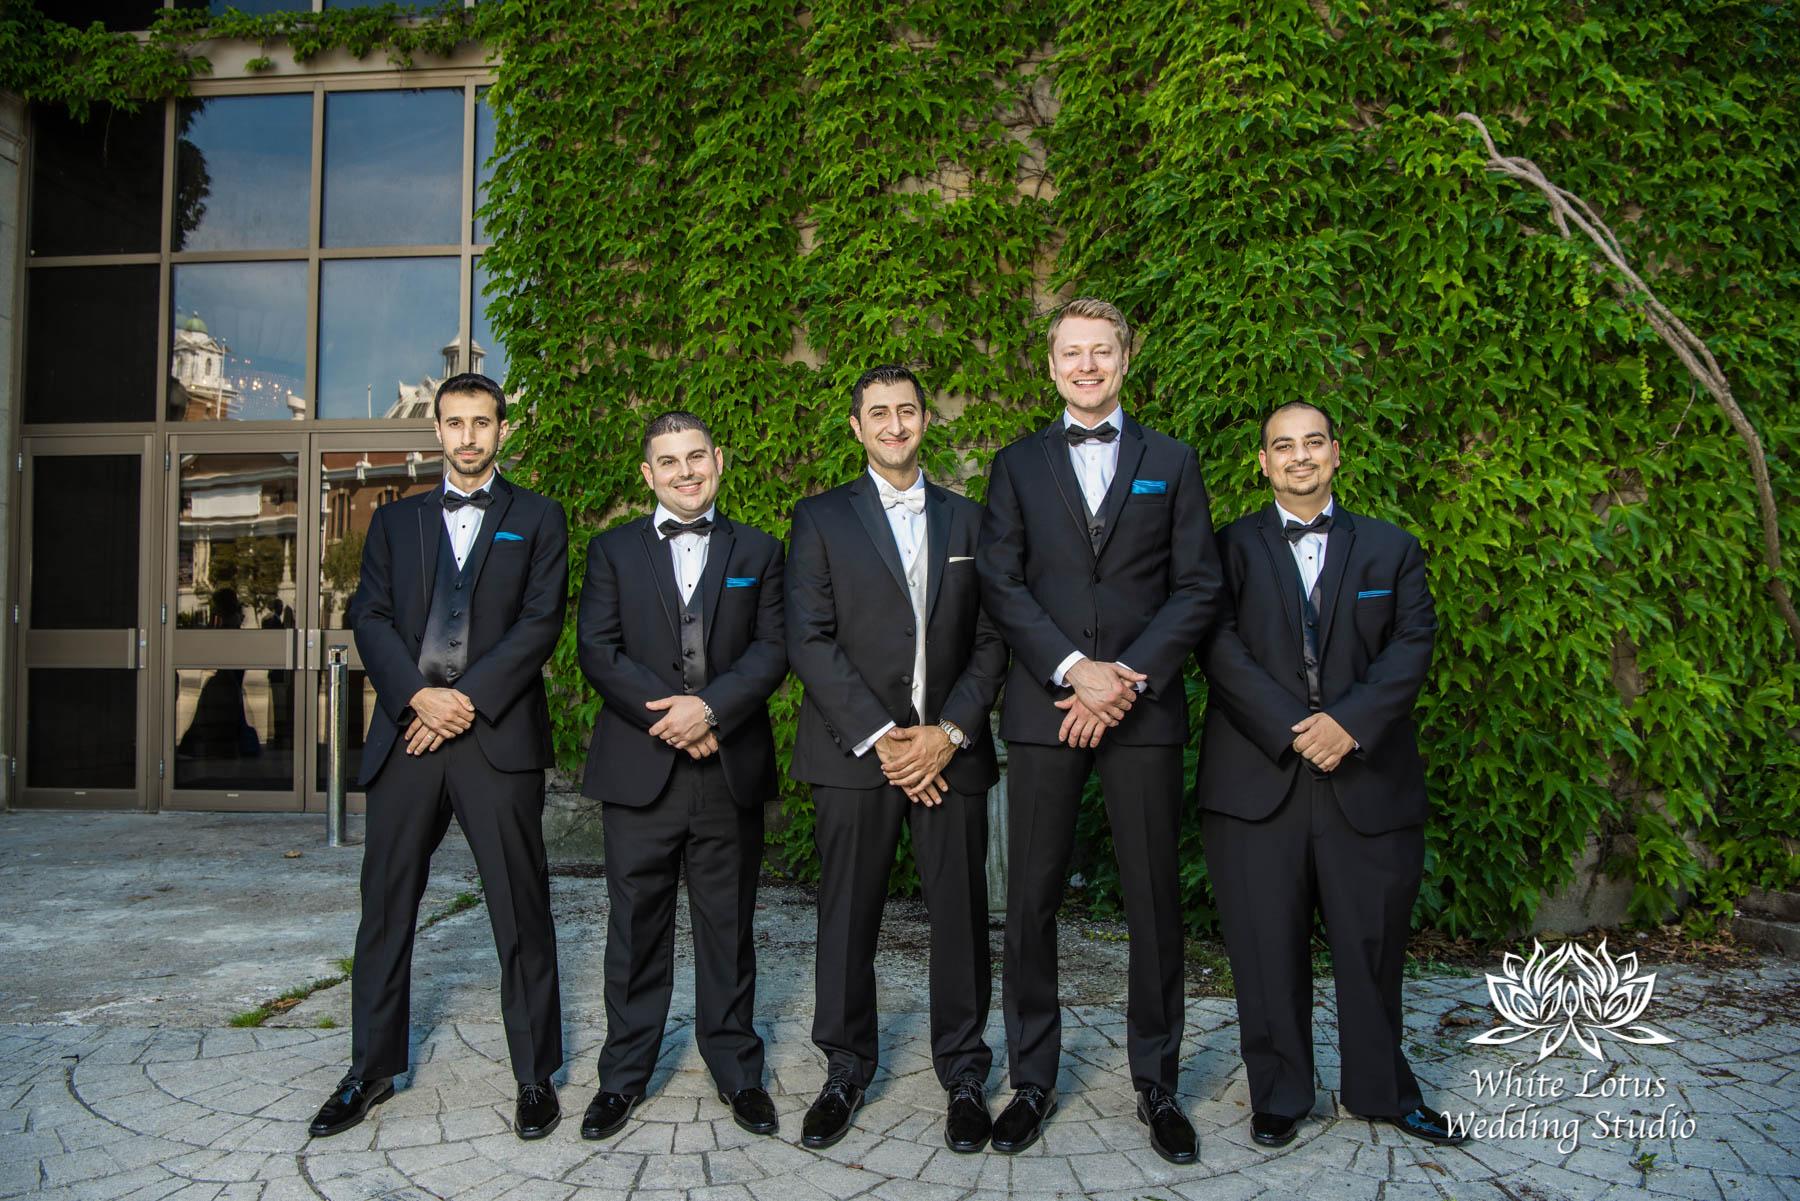 169 - Wedding - Toronto - Liberty Grand - Groomsmen - PW